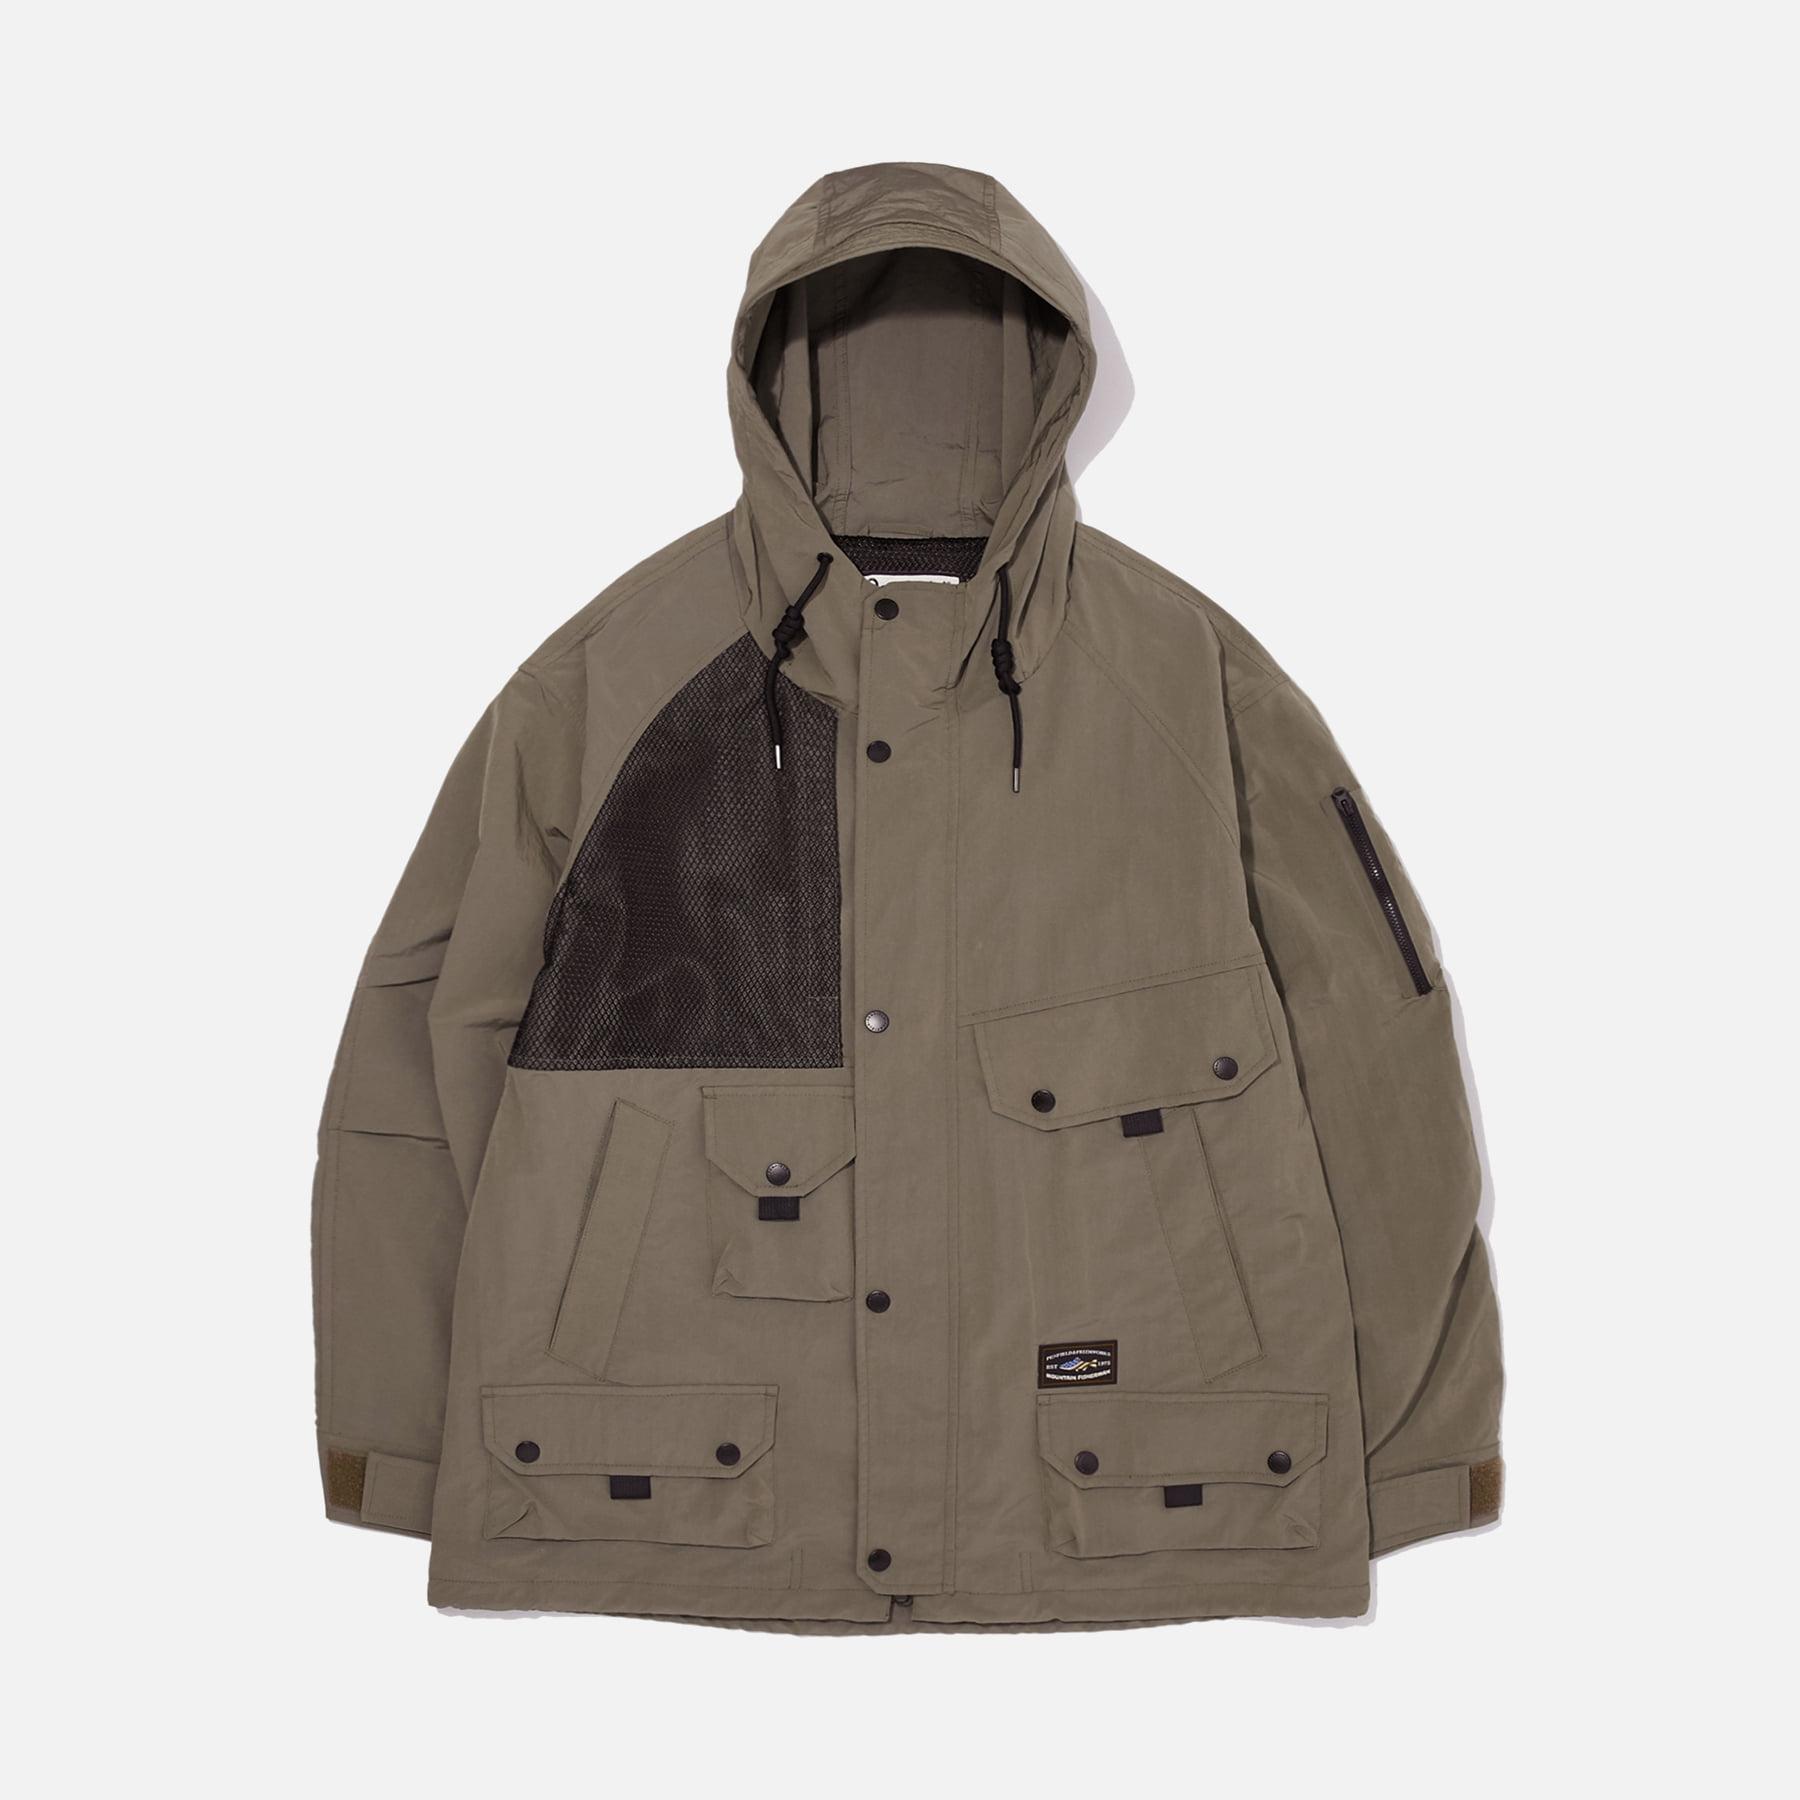 [PENFIELD X FRIZMWORKS] Utility cargo pocket setup jacket _ light brown